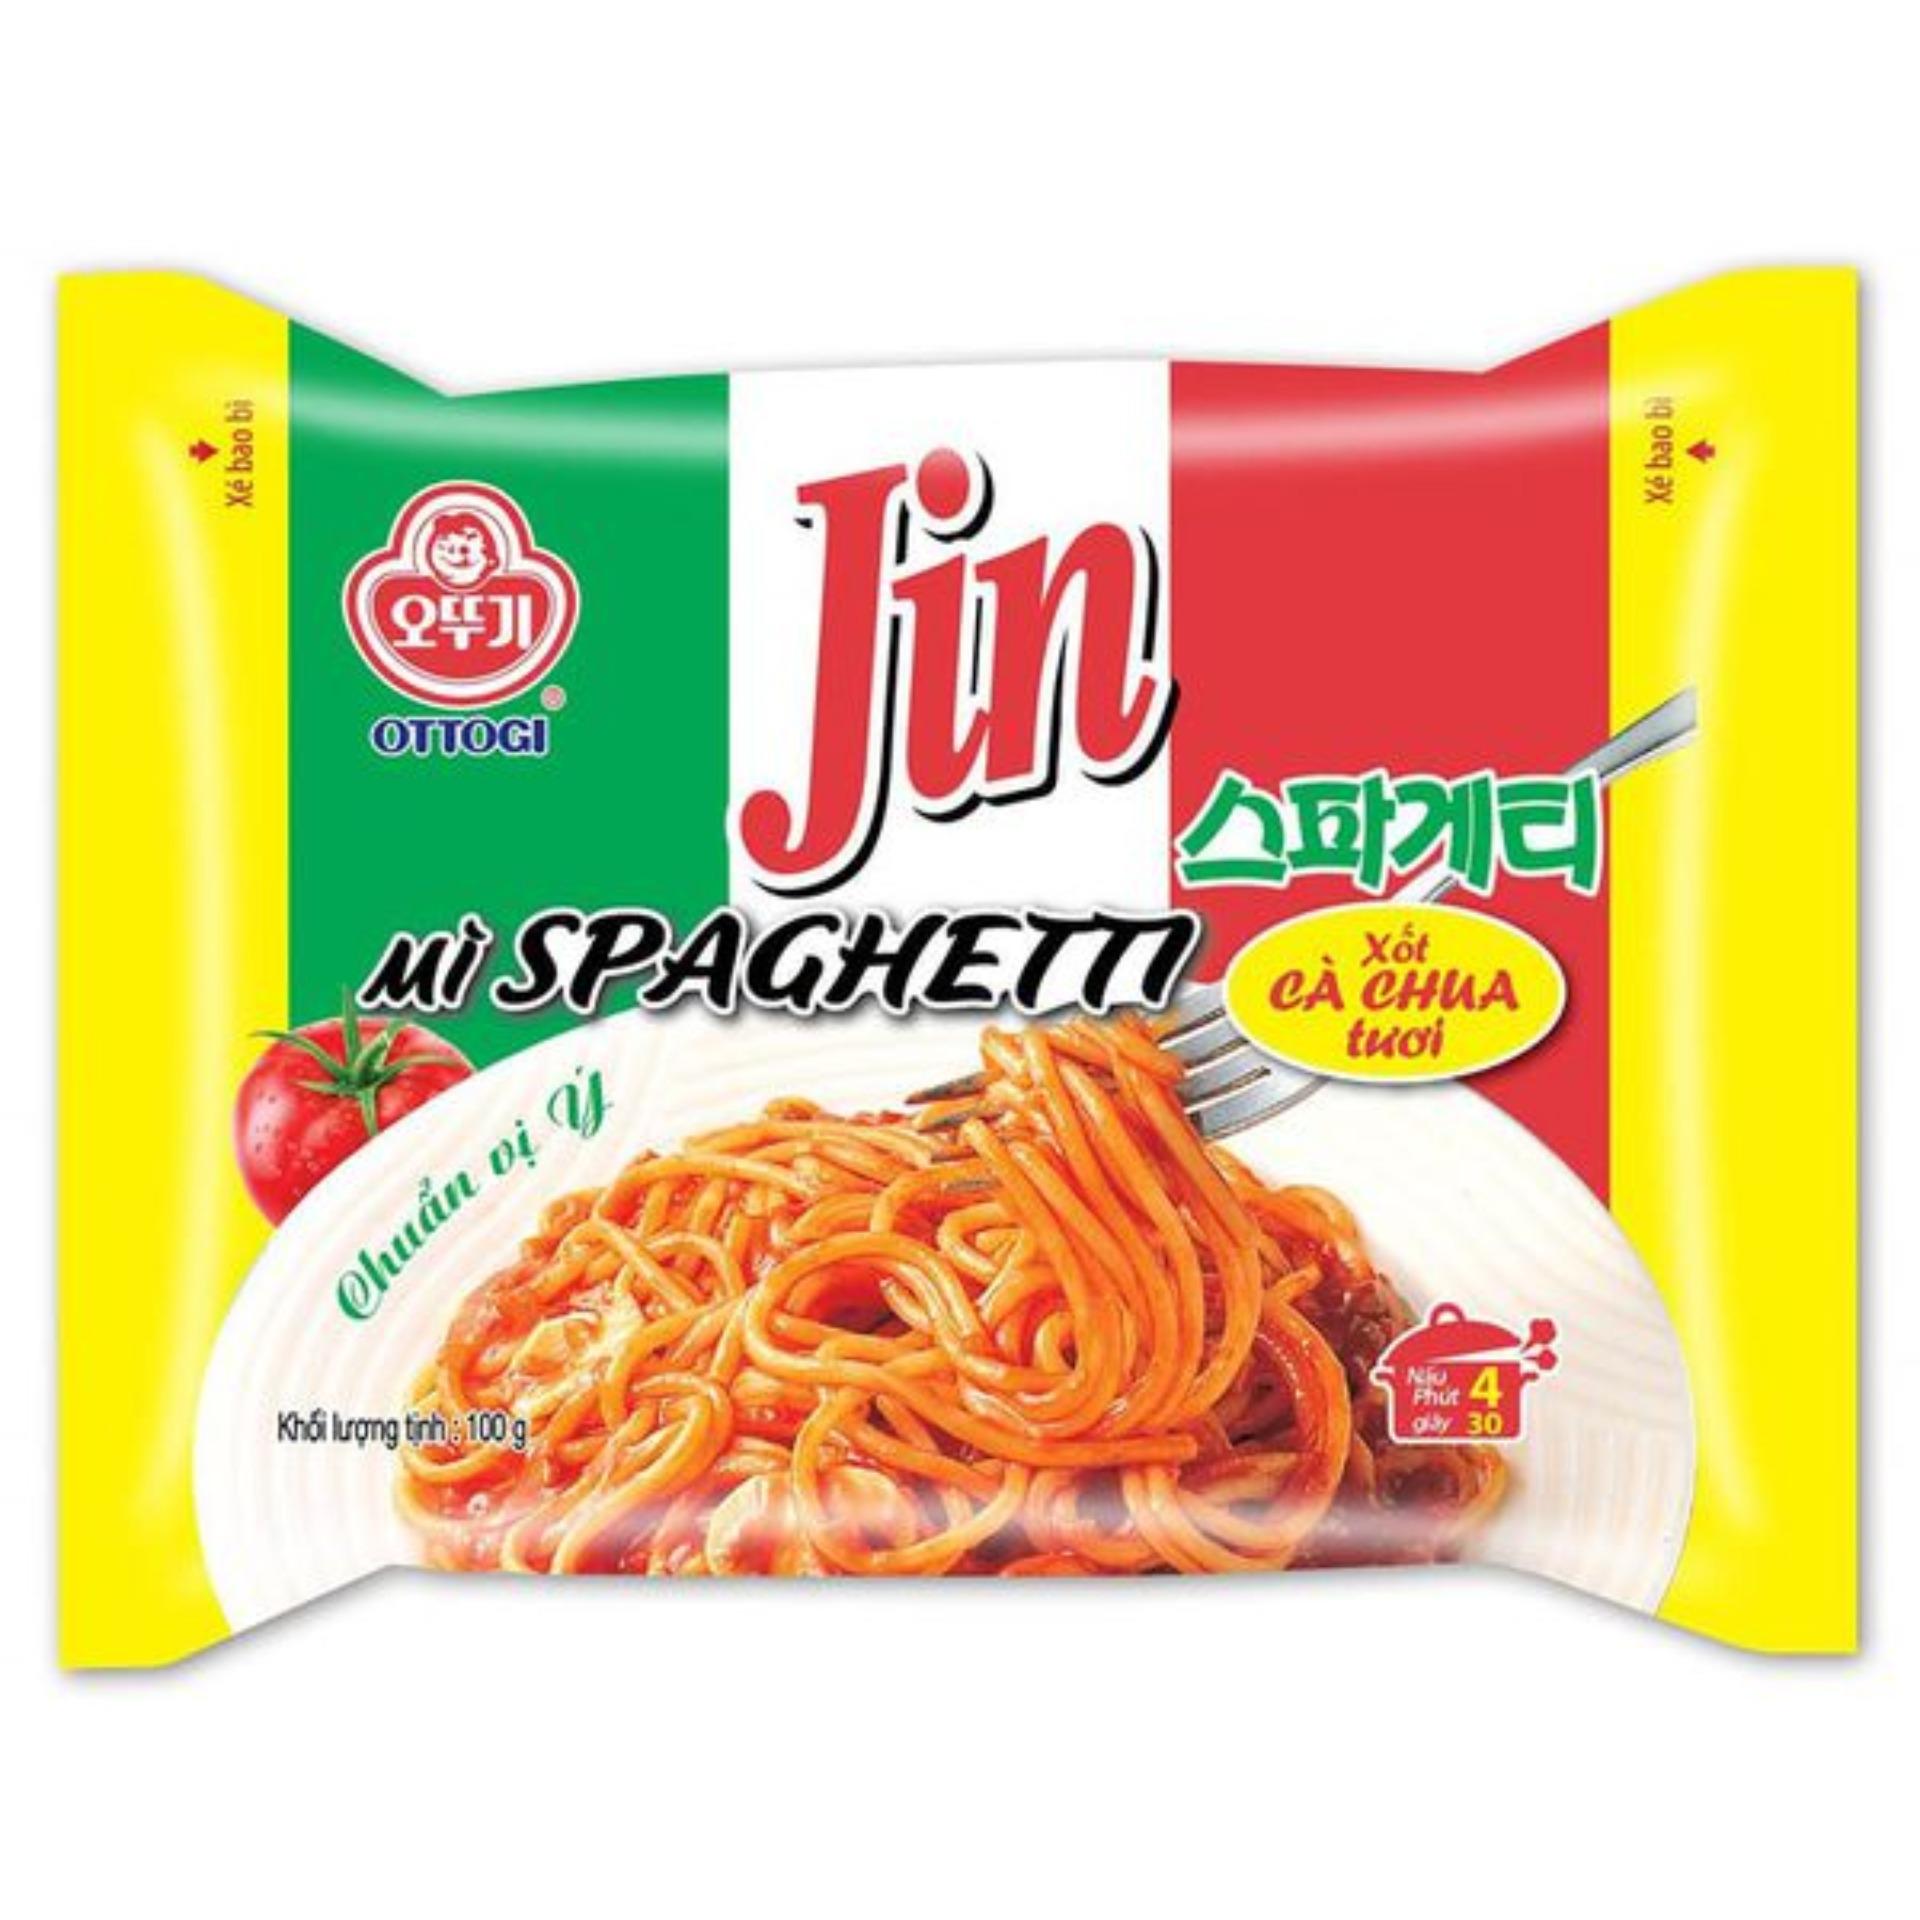 Mì Ottogi Spaghetti xốt cà chua tươi VN 100gr